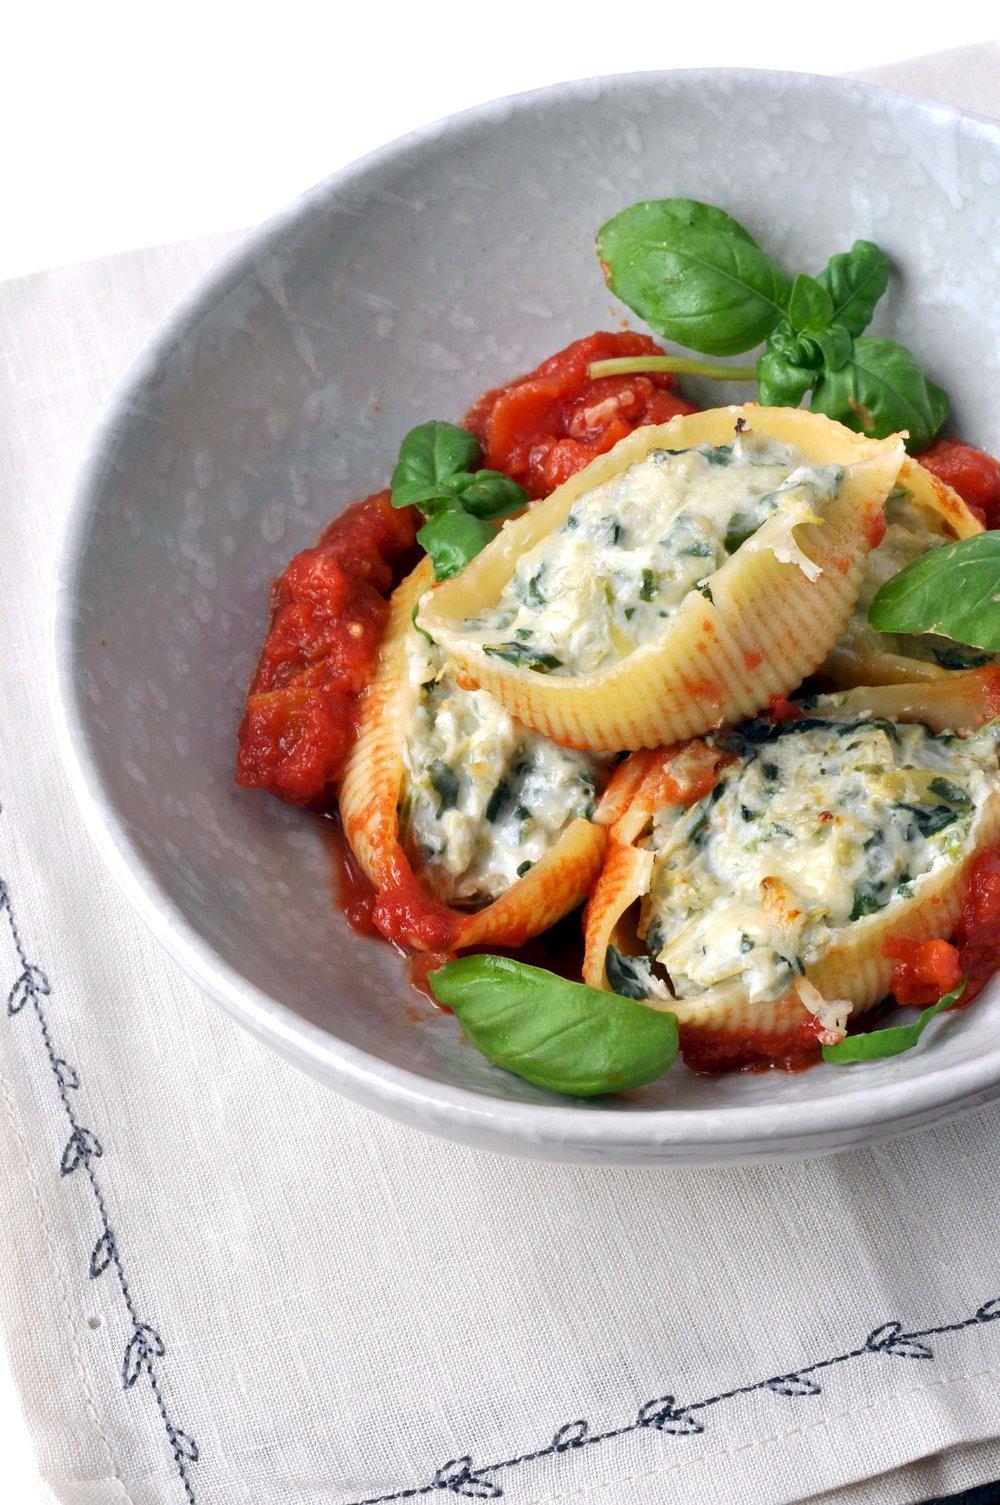 Spinach Artichoke Stuffed Pasta Shells | Shiny Happy Bright